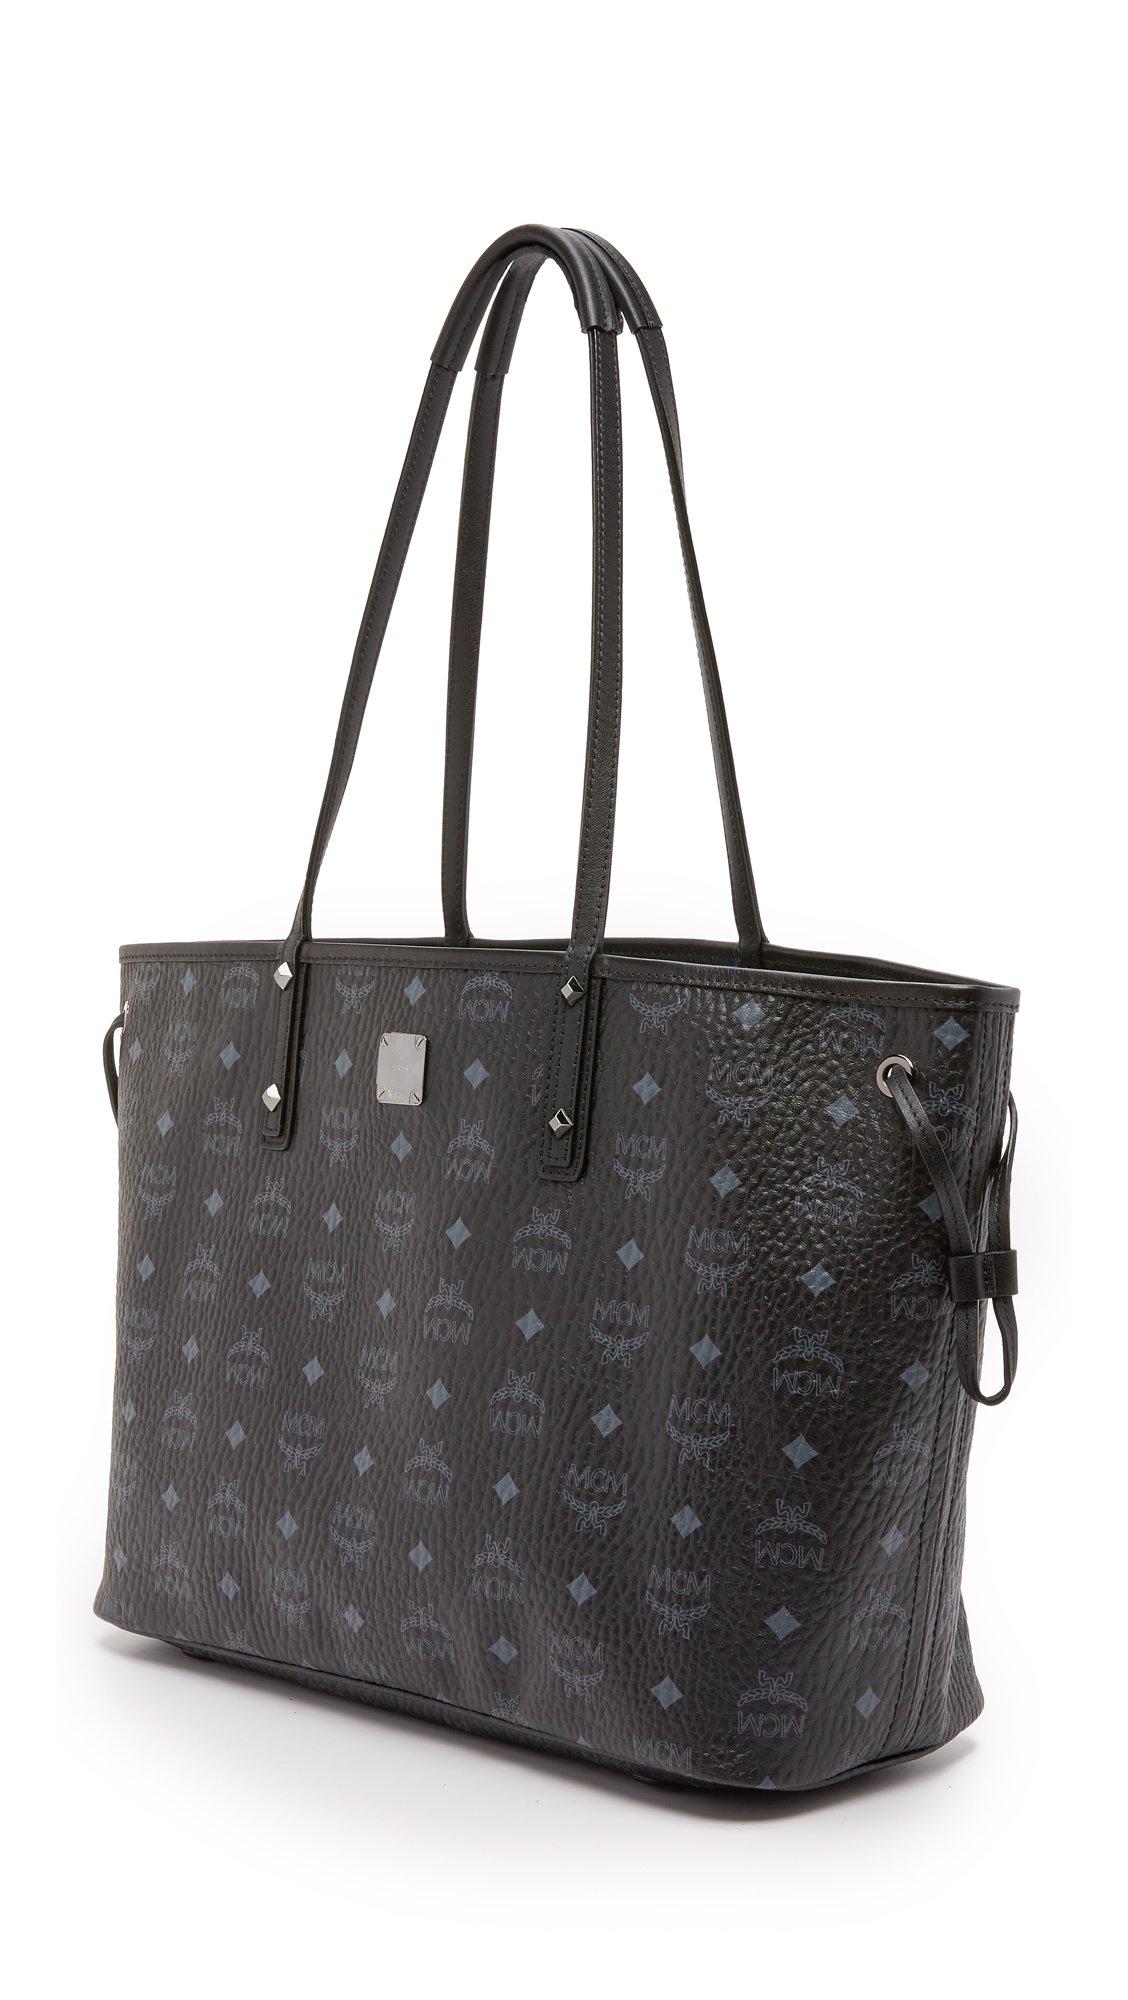 MCM Leather Shopper Tote - Black